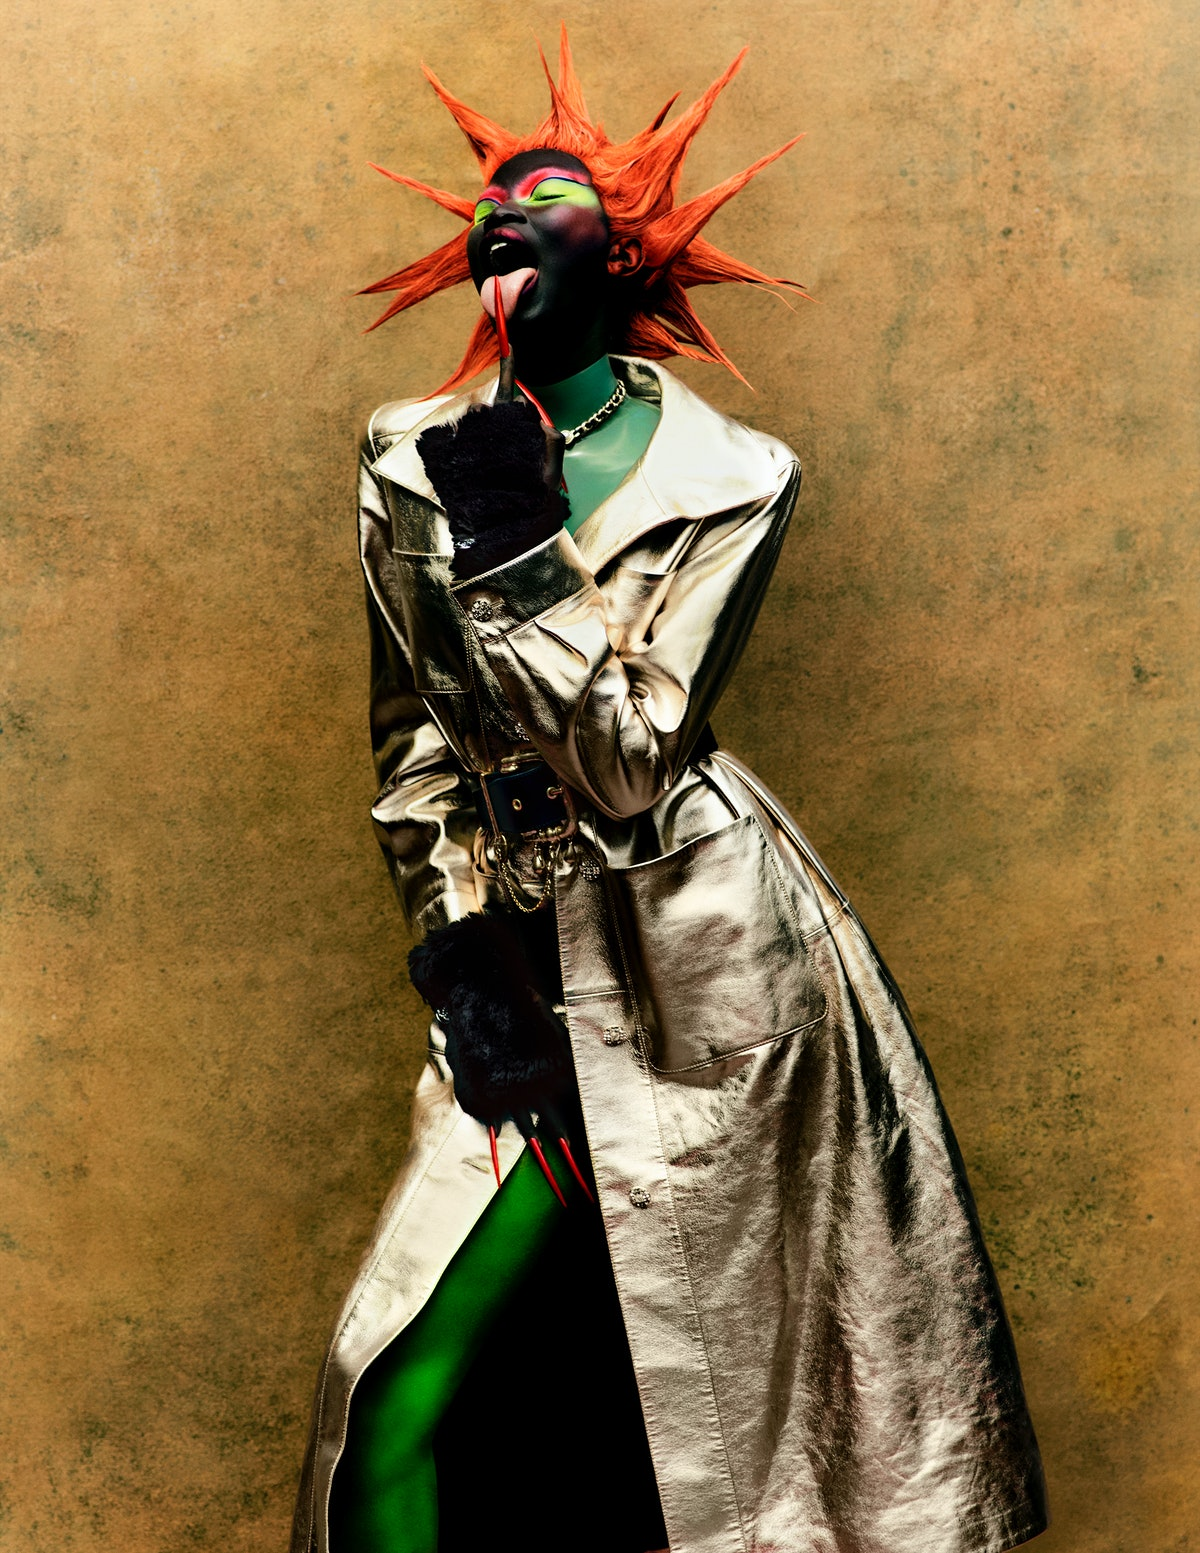 Adhel Bol wears a Chanel coat, necklace, and gloves; Atsuko Kudo top; Schiaparelli belt.